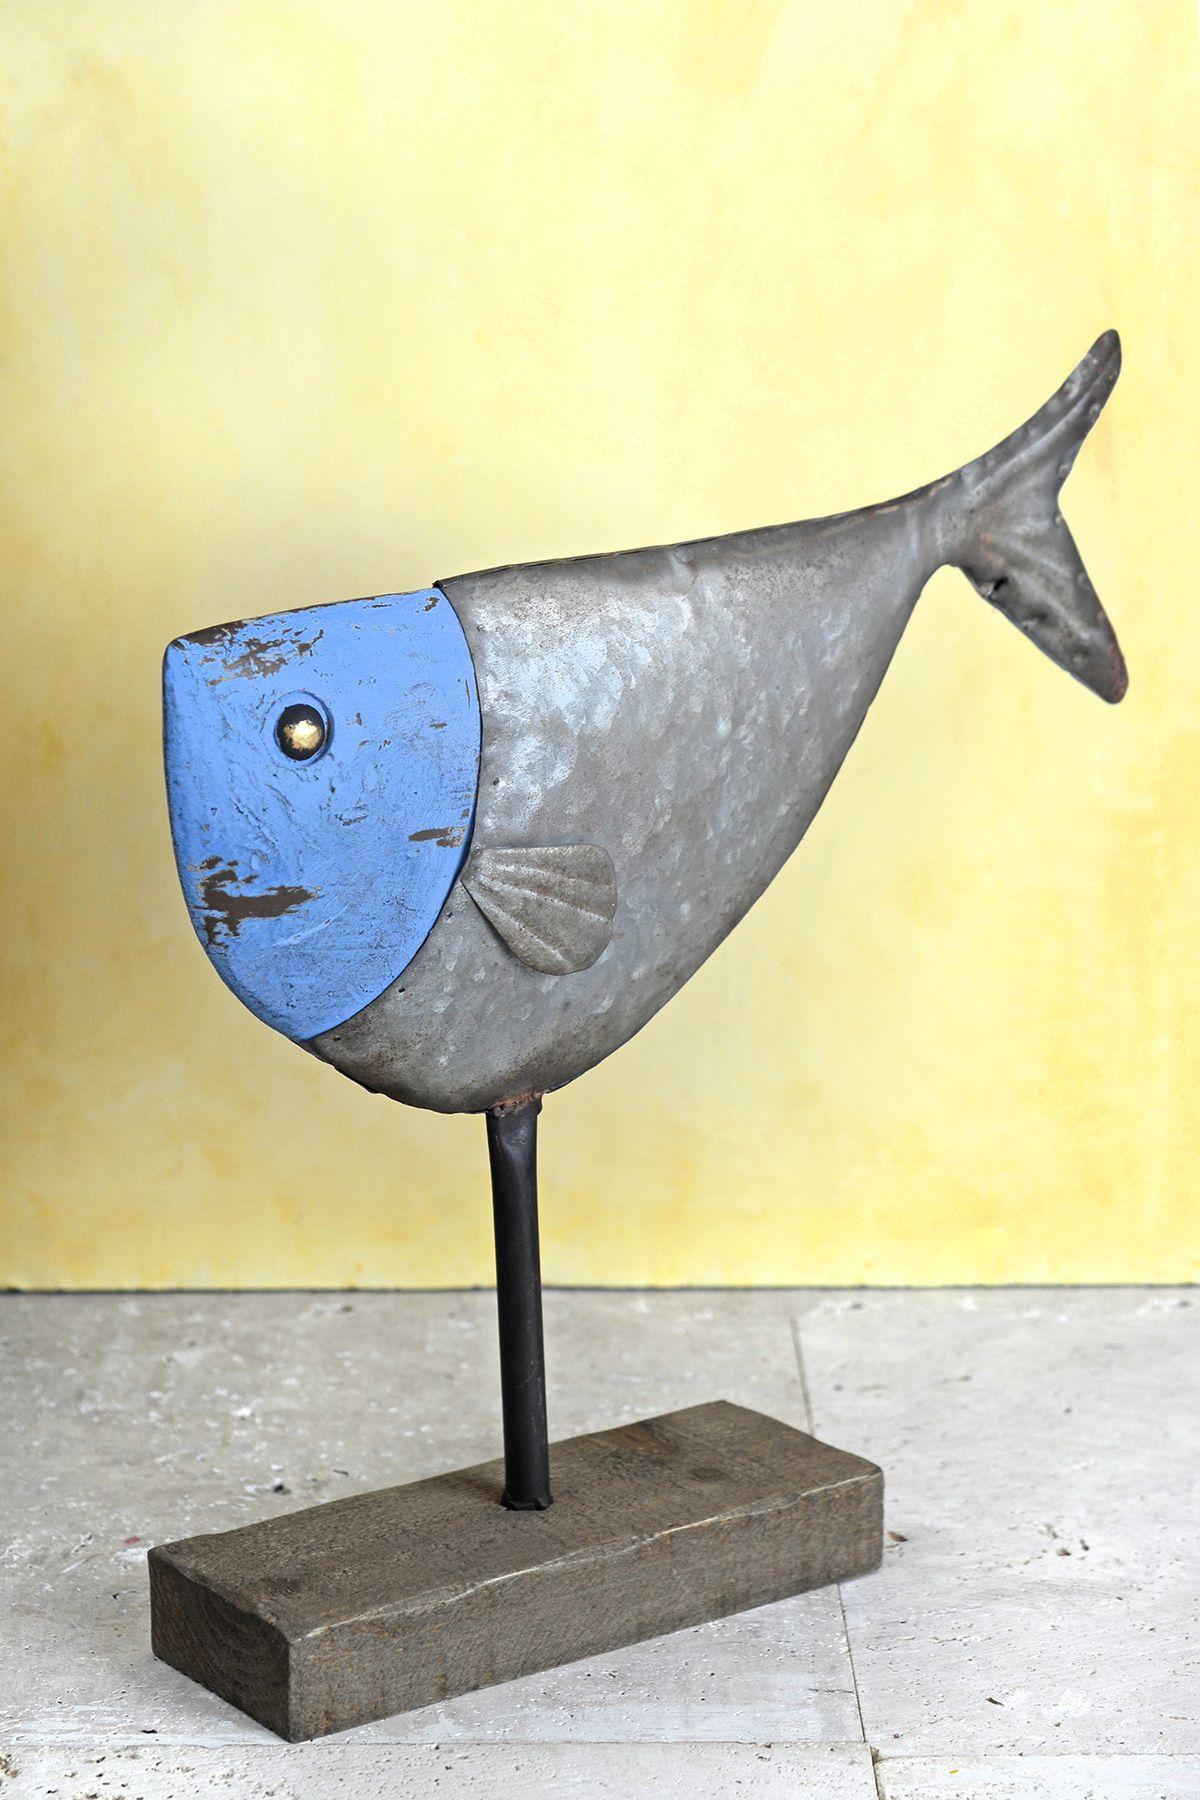 Nautical Decor & Decorations | Home Decor | Pinterest | Folk art ...